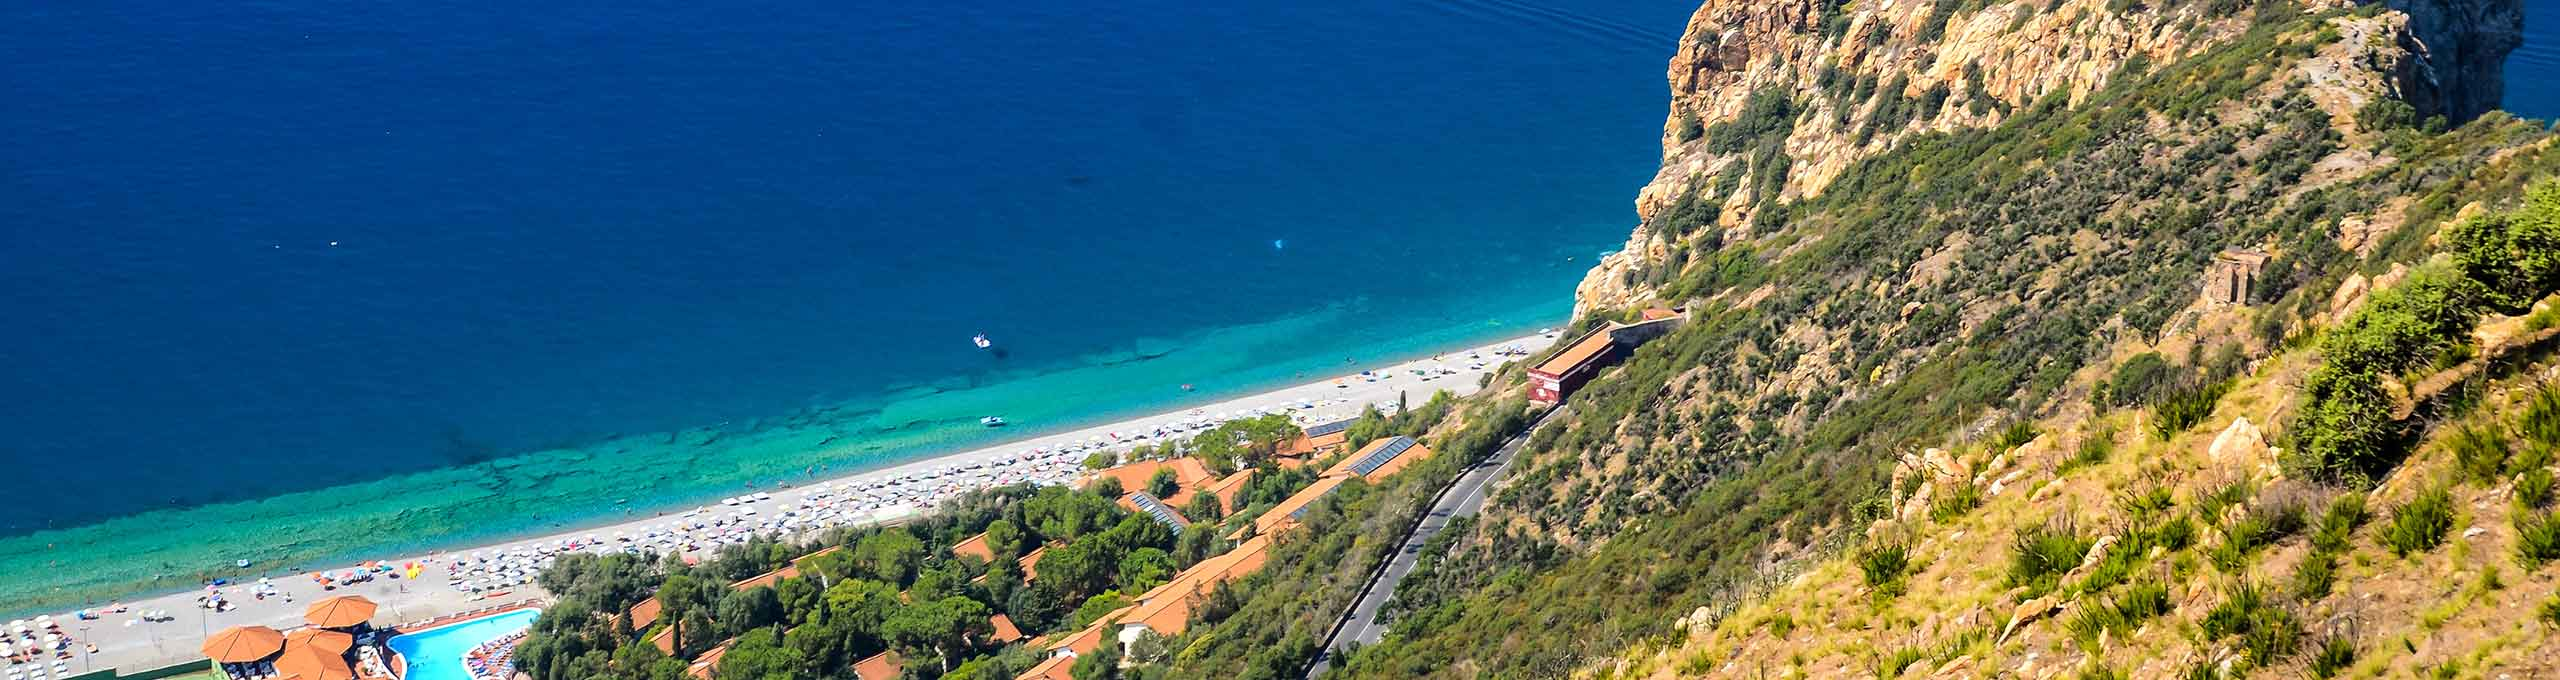 Gioiosa Marea, Costa Saracena